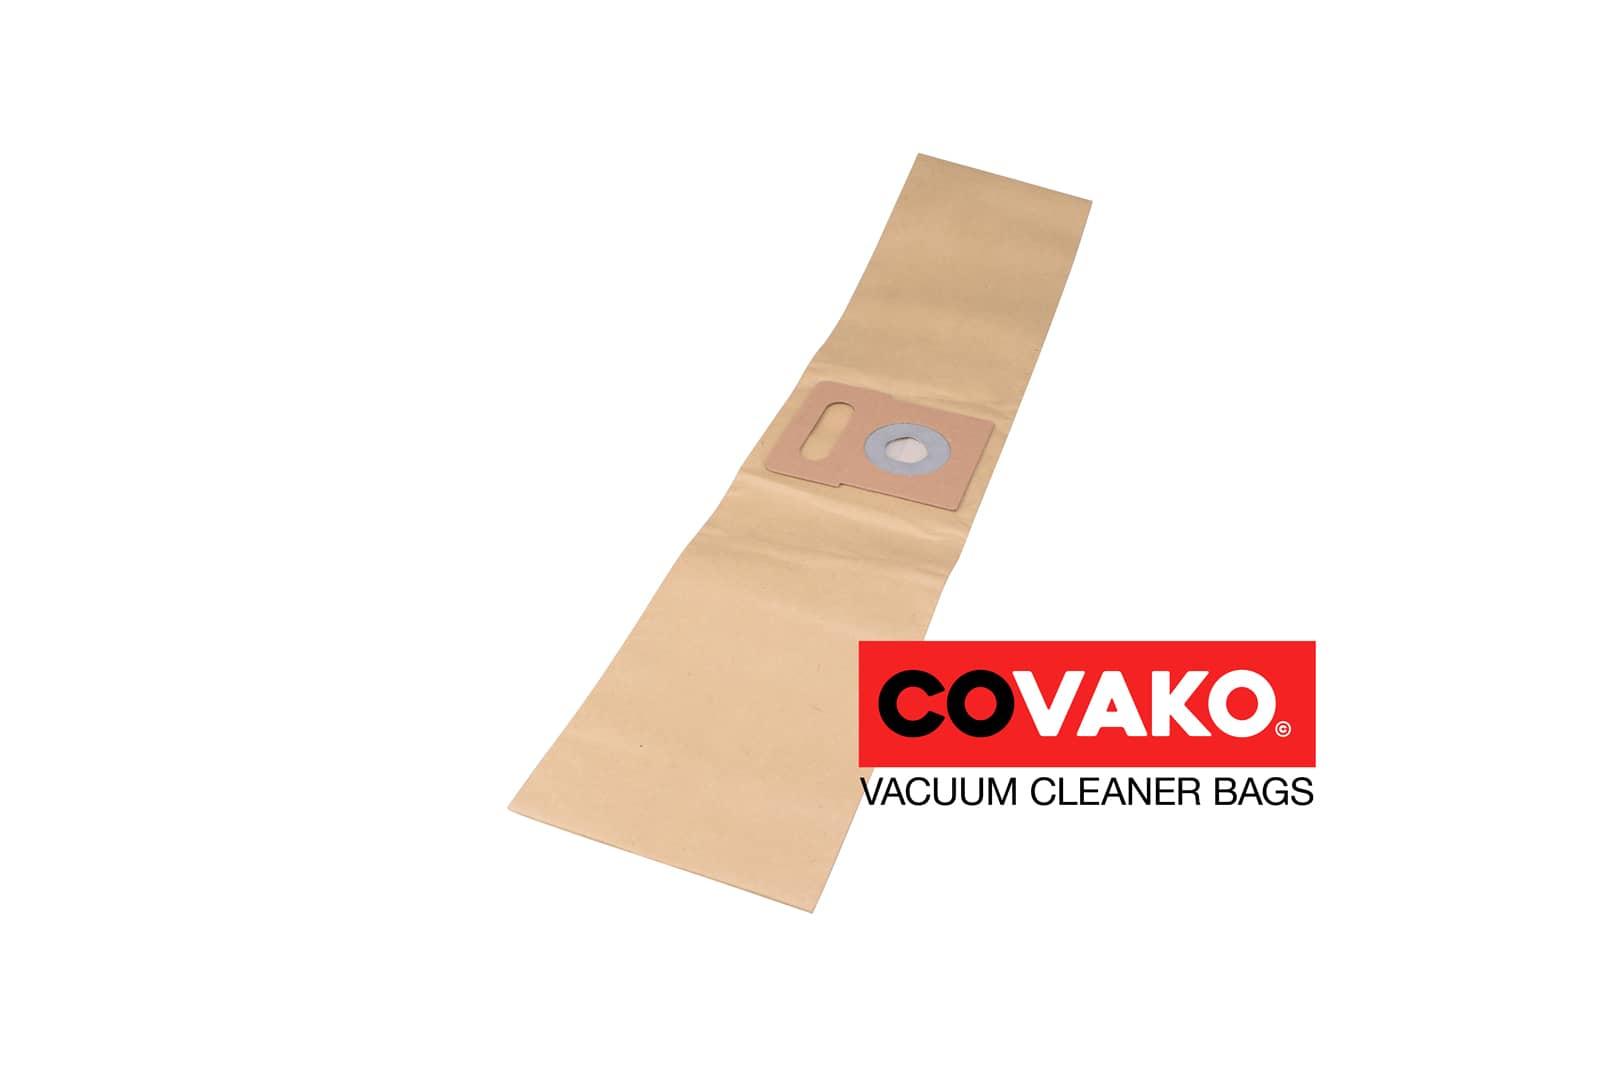 Fast Profi / Paper - Fast vacuum cleaner bags